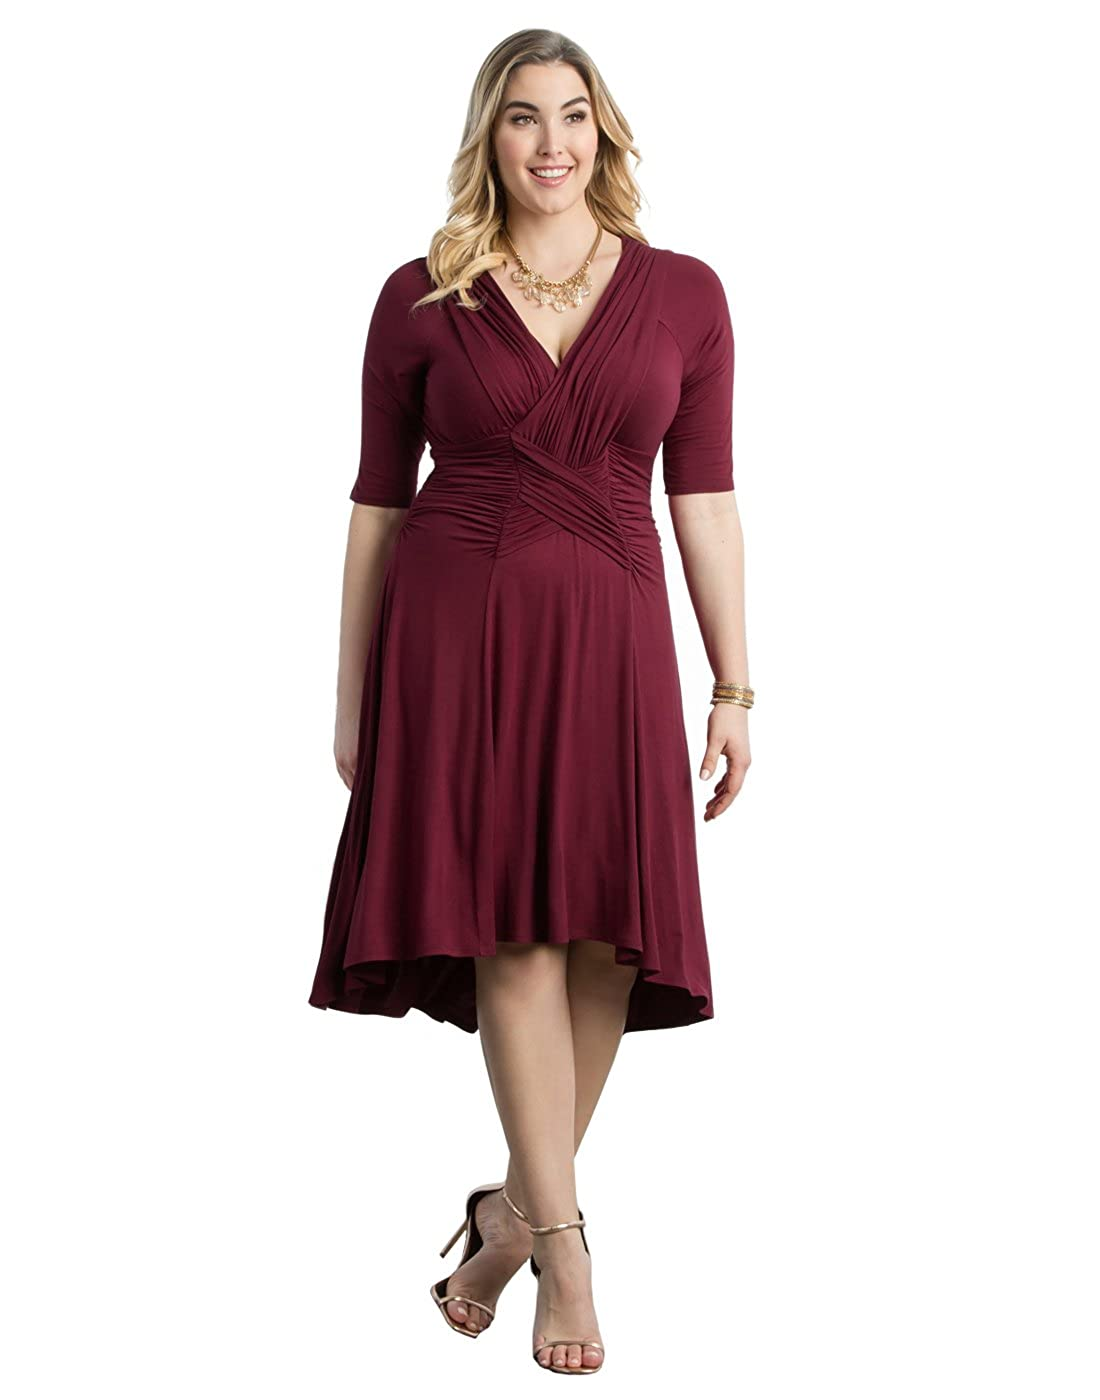 Amazon.com: Kiyonna Women\'s Plus Size Refined Ruched Dress 1X Merlot ...